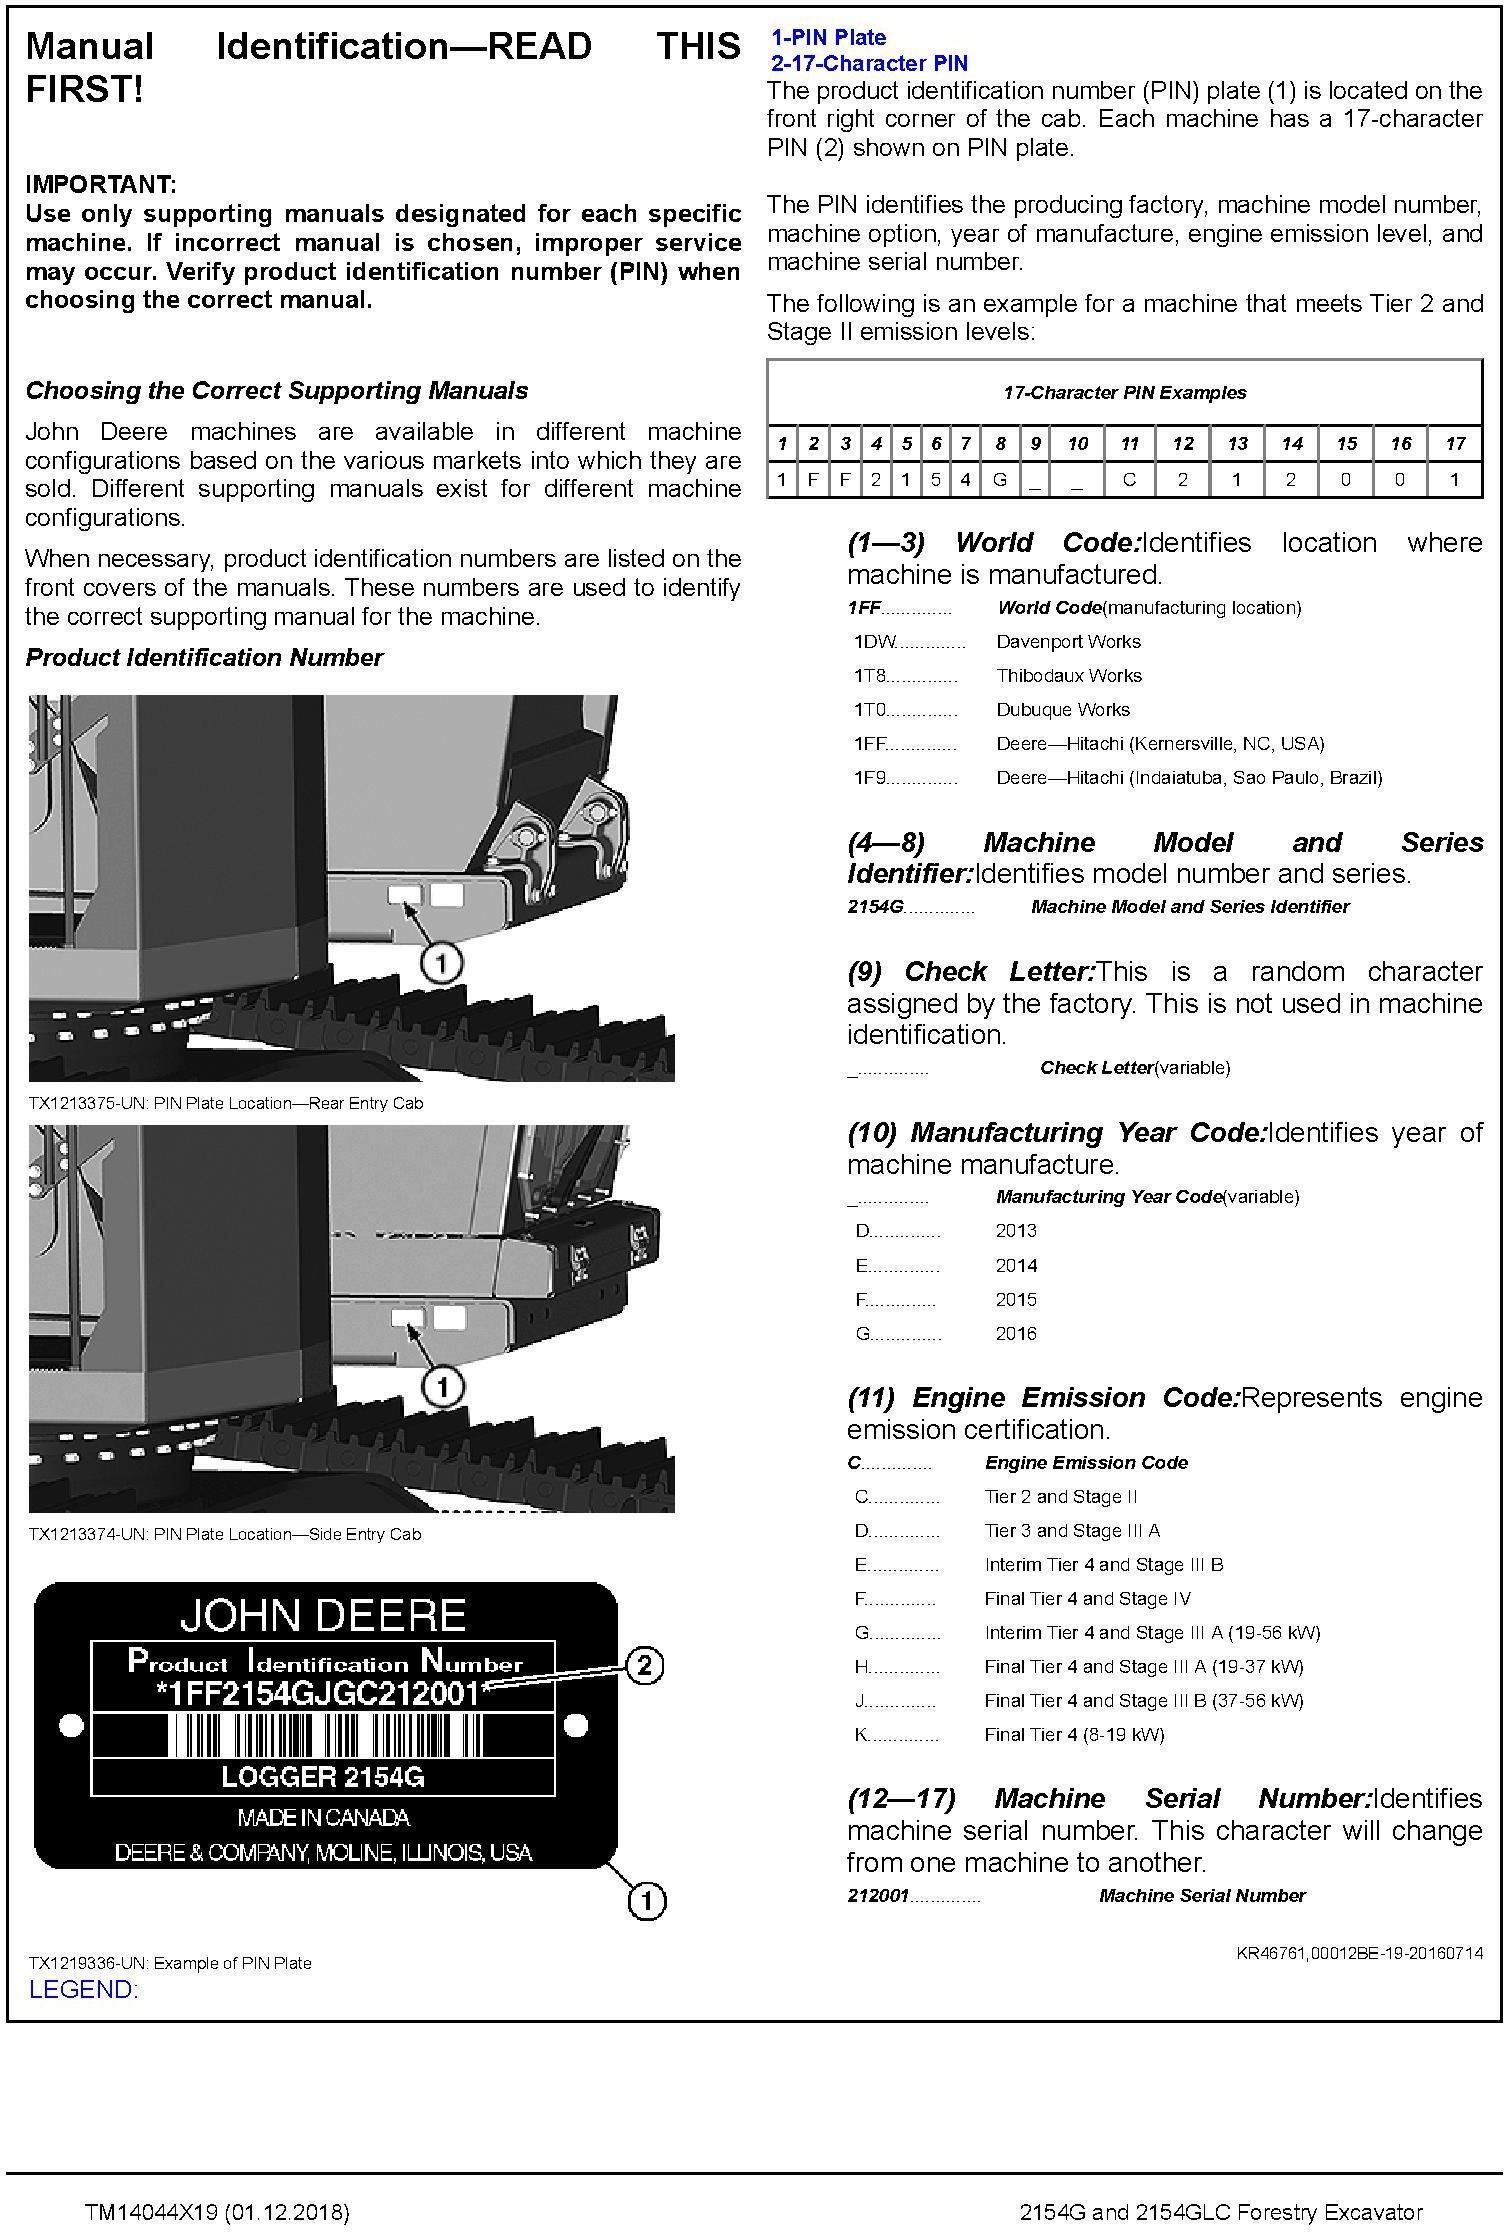 John Deere 2154G,2154GLC (SN.C212001-,D212001-) Forestry Excavator Repair Service Manual(TM14044X19) - 1